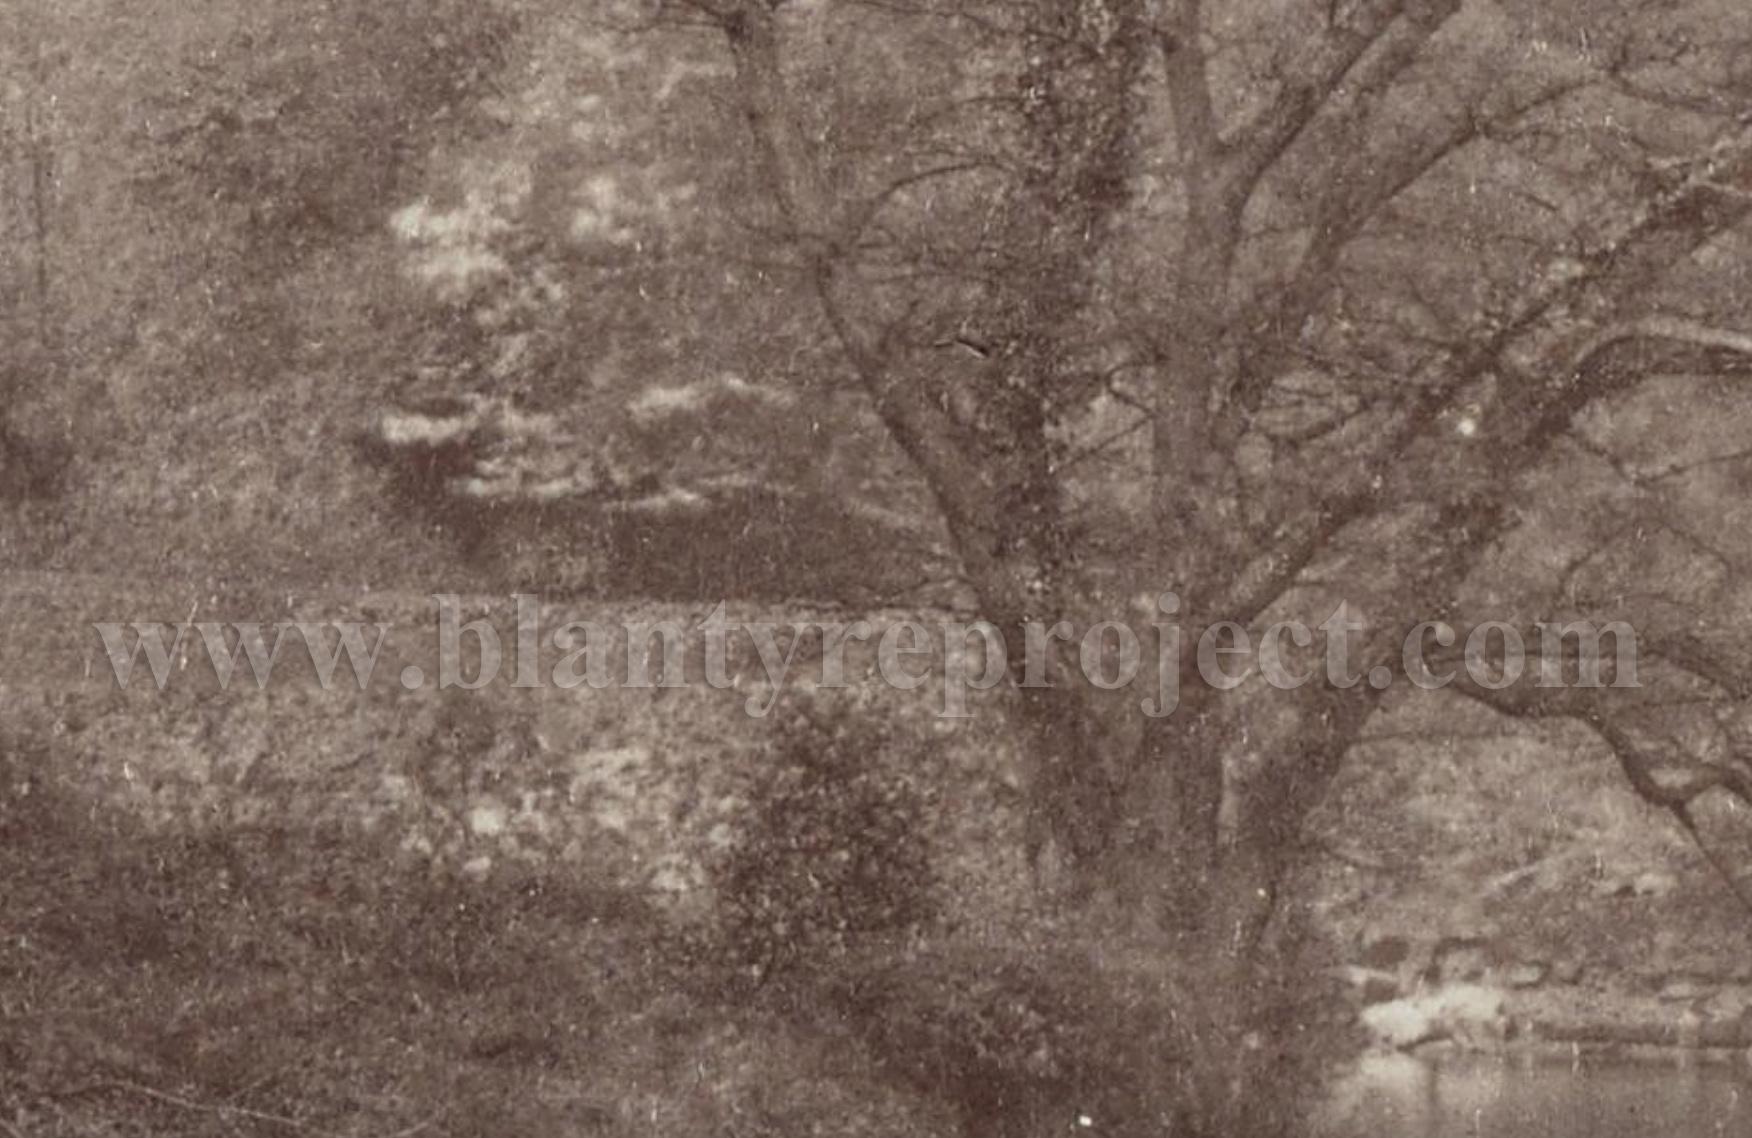 1870 Bothwell Riverbank James Valentine